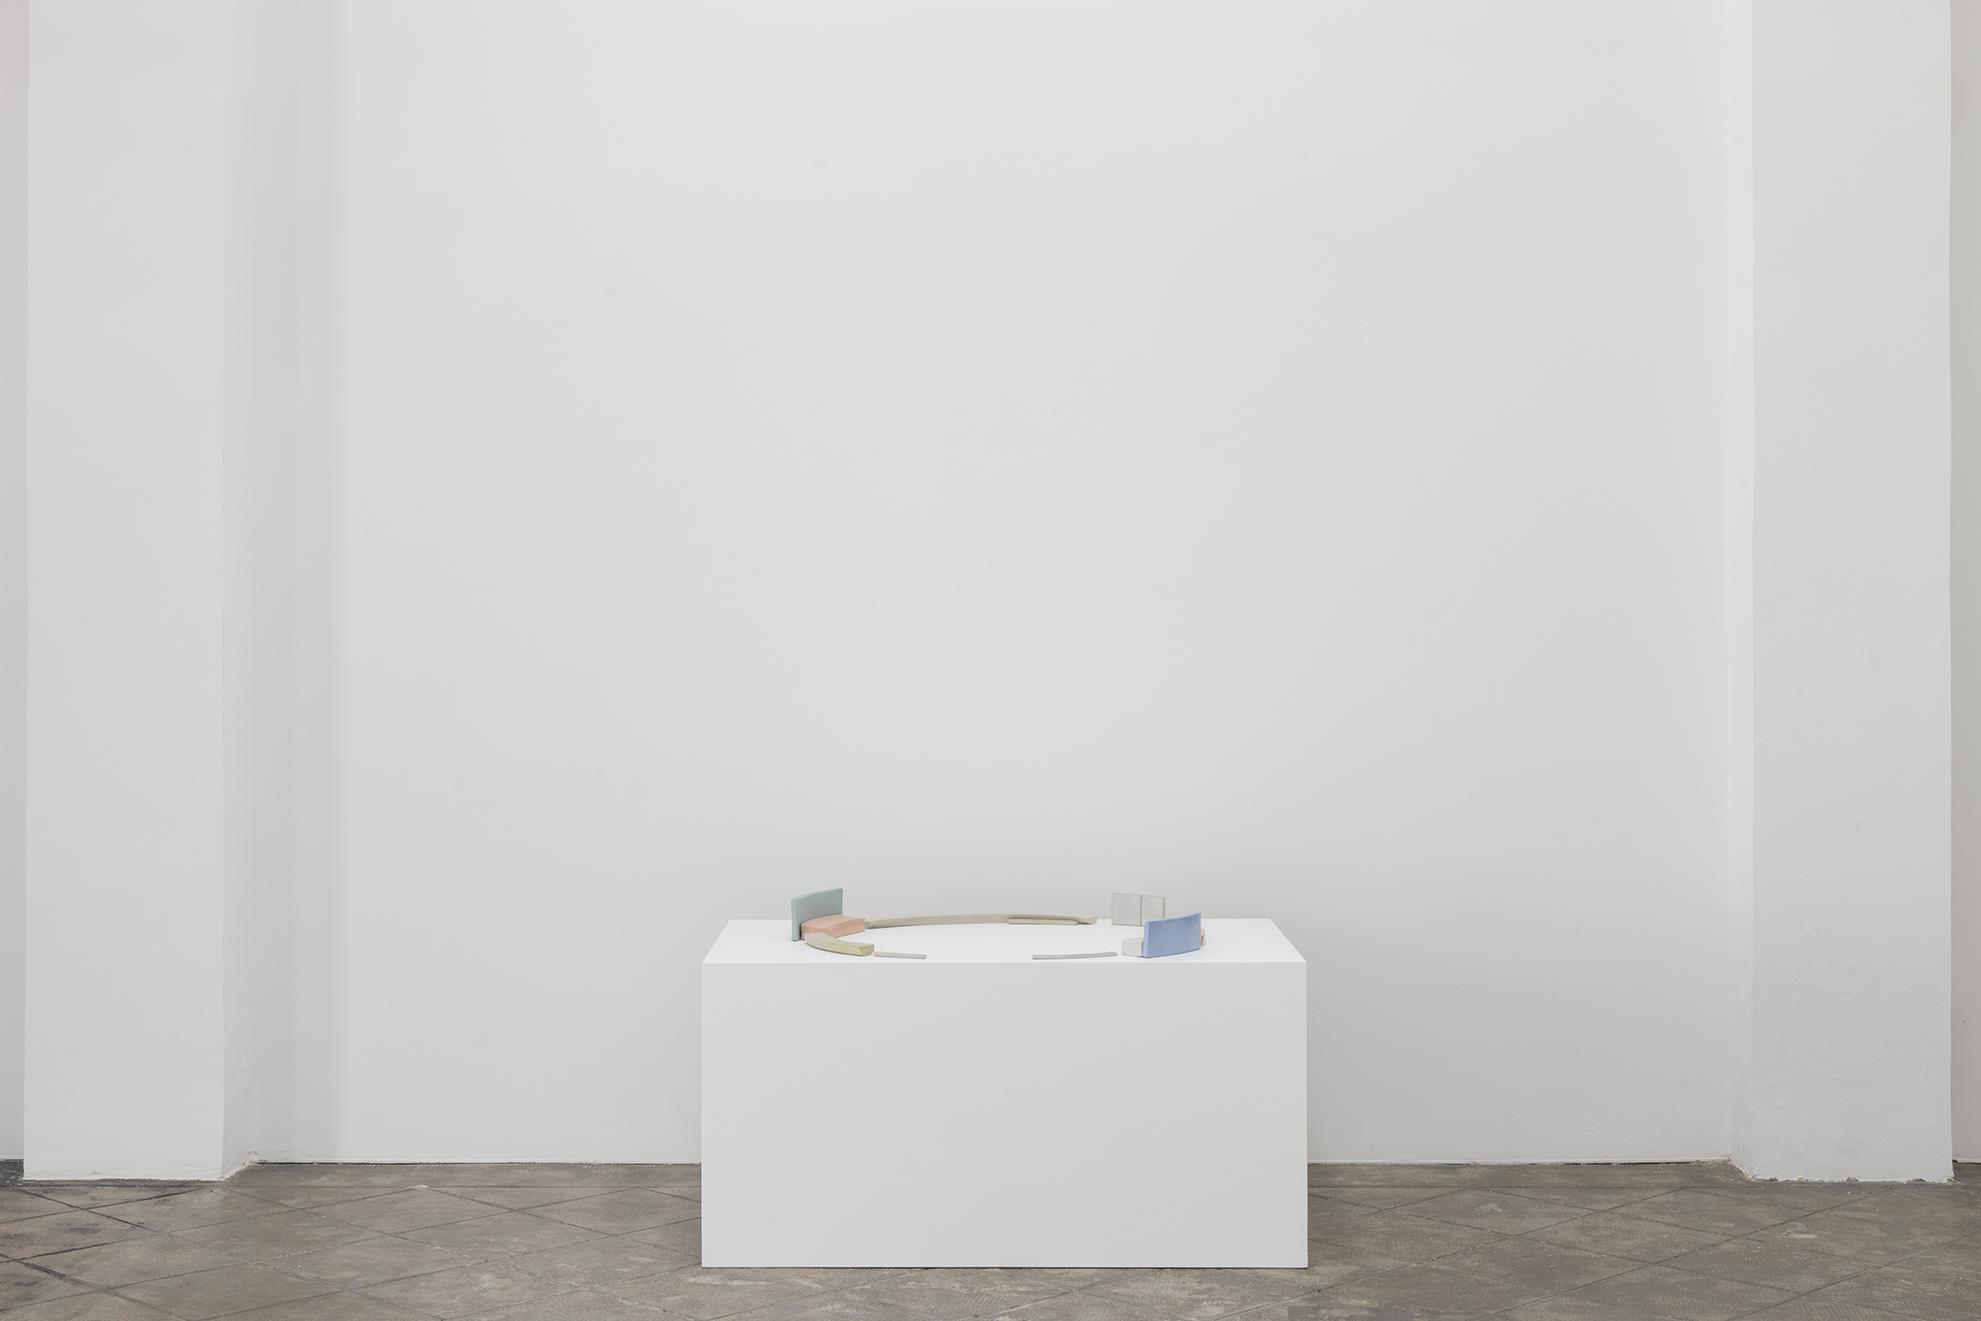 Installation view: Accrochage #4: Dauder, Jotta, Mendizabal & Oriol Aribau, ProjecteSD | Accrochage #4: Dauder, Jotta, Mendizabal & Oriol Aribau | ProjecteSD